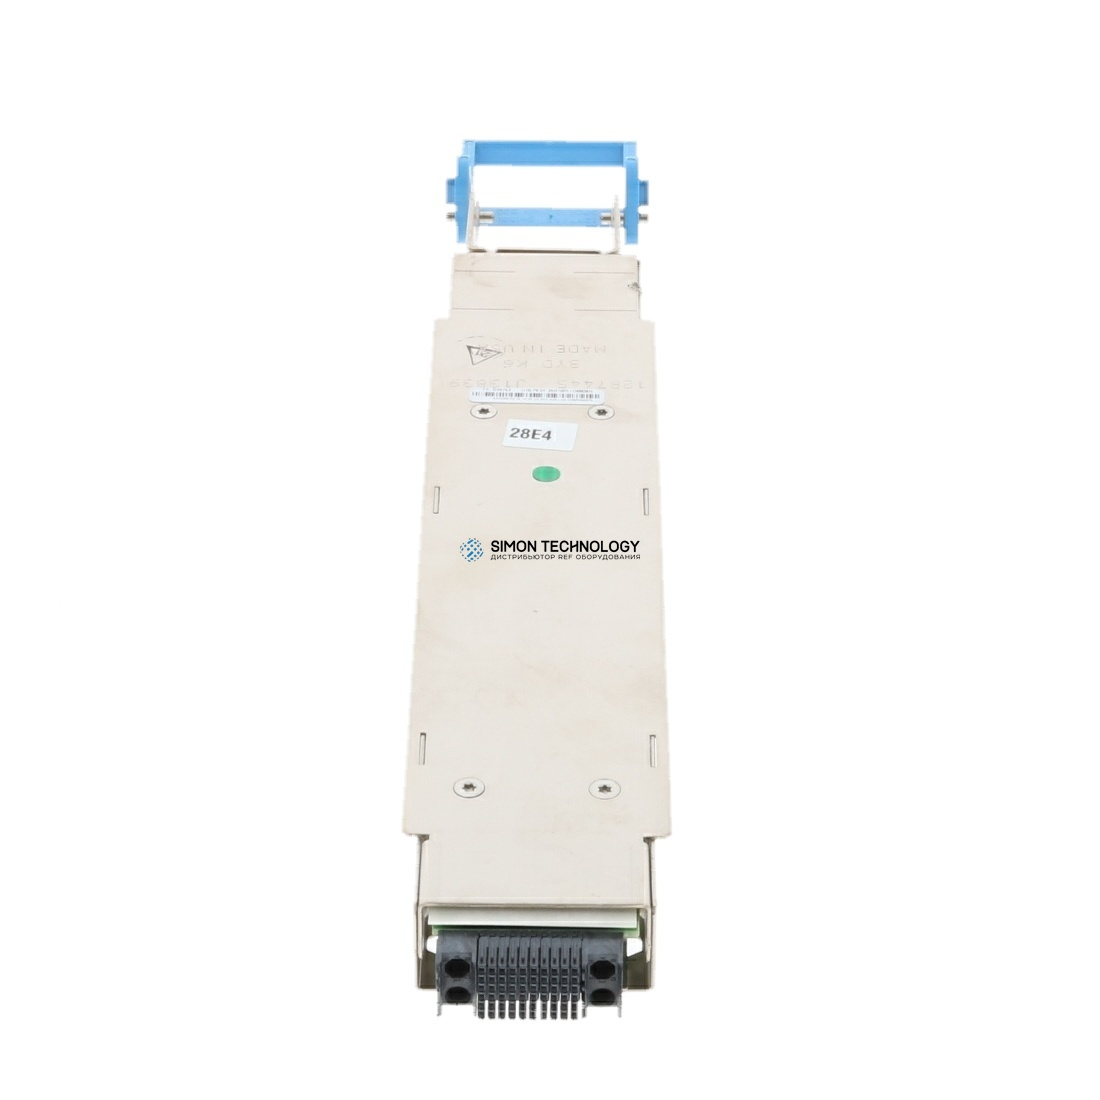 IBM PROGRAMMABLE PROCESSOR CLOCK CARD (39J0188)